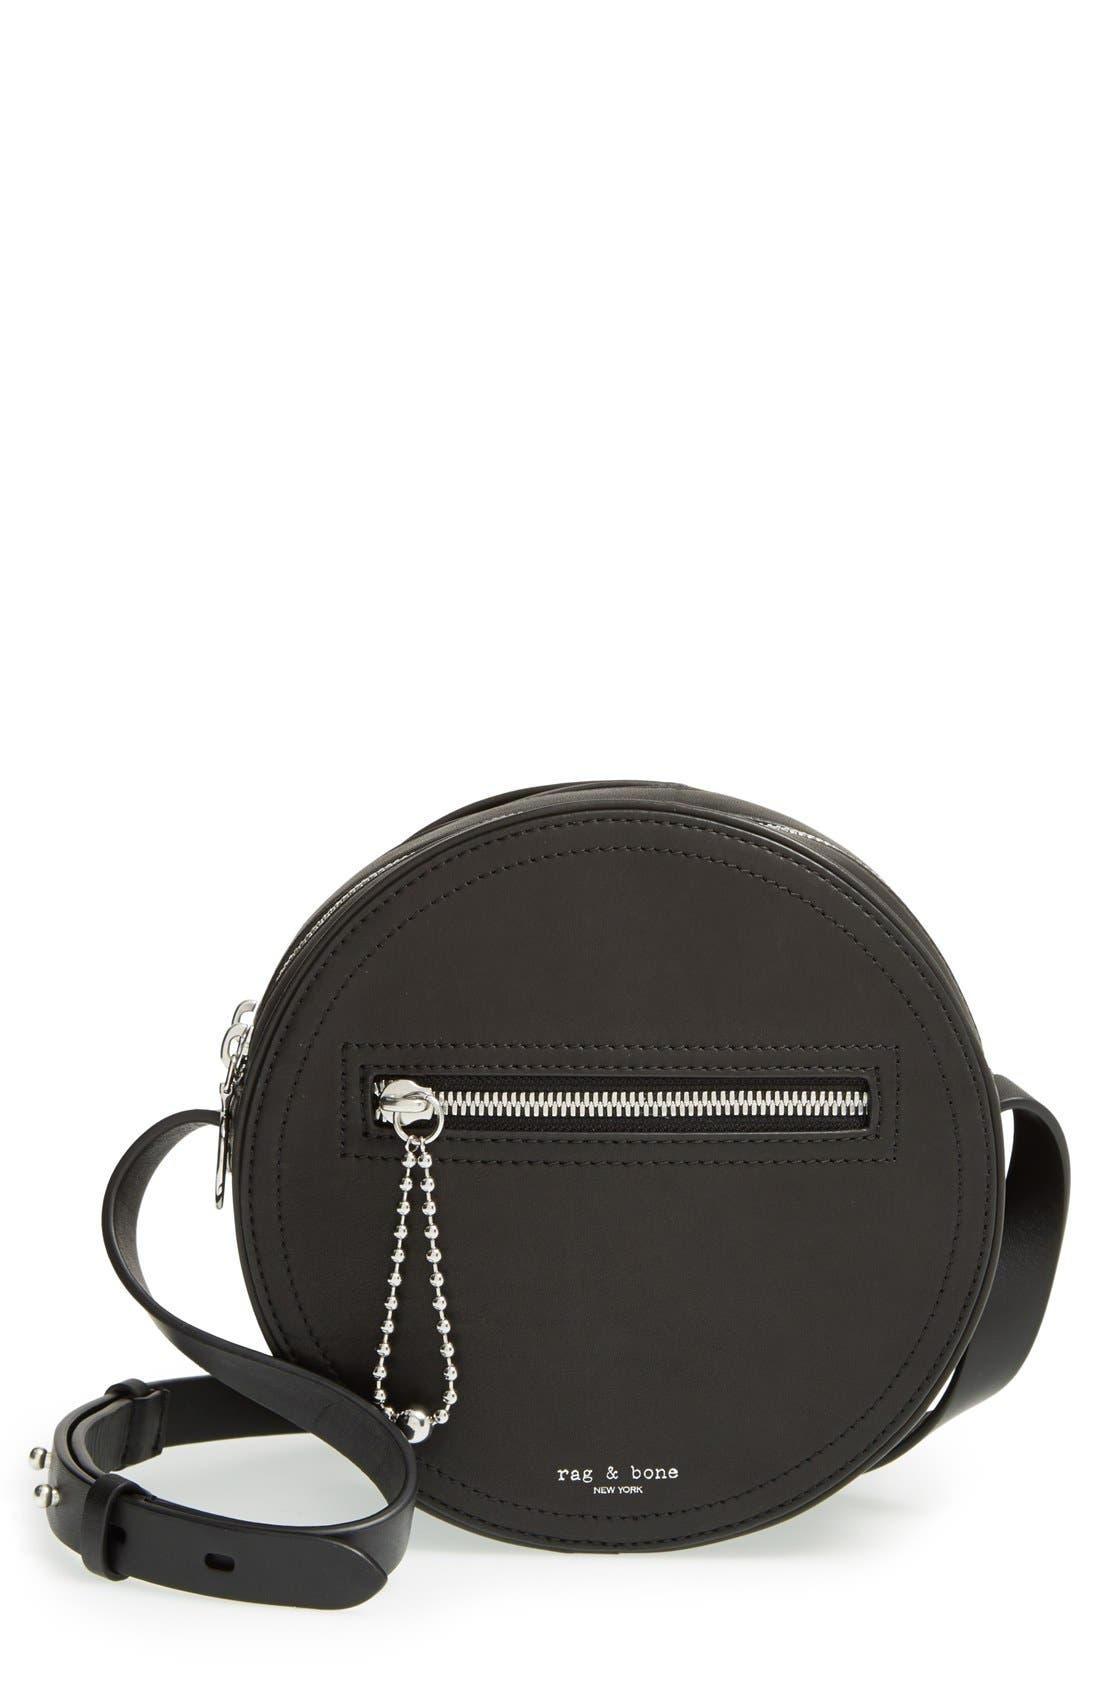 Main Image - rag & bone 'Circle' Leather Crossbody Bag